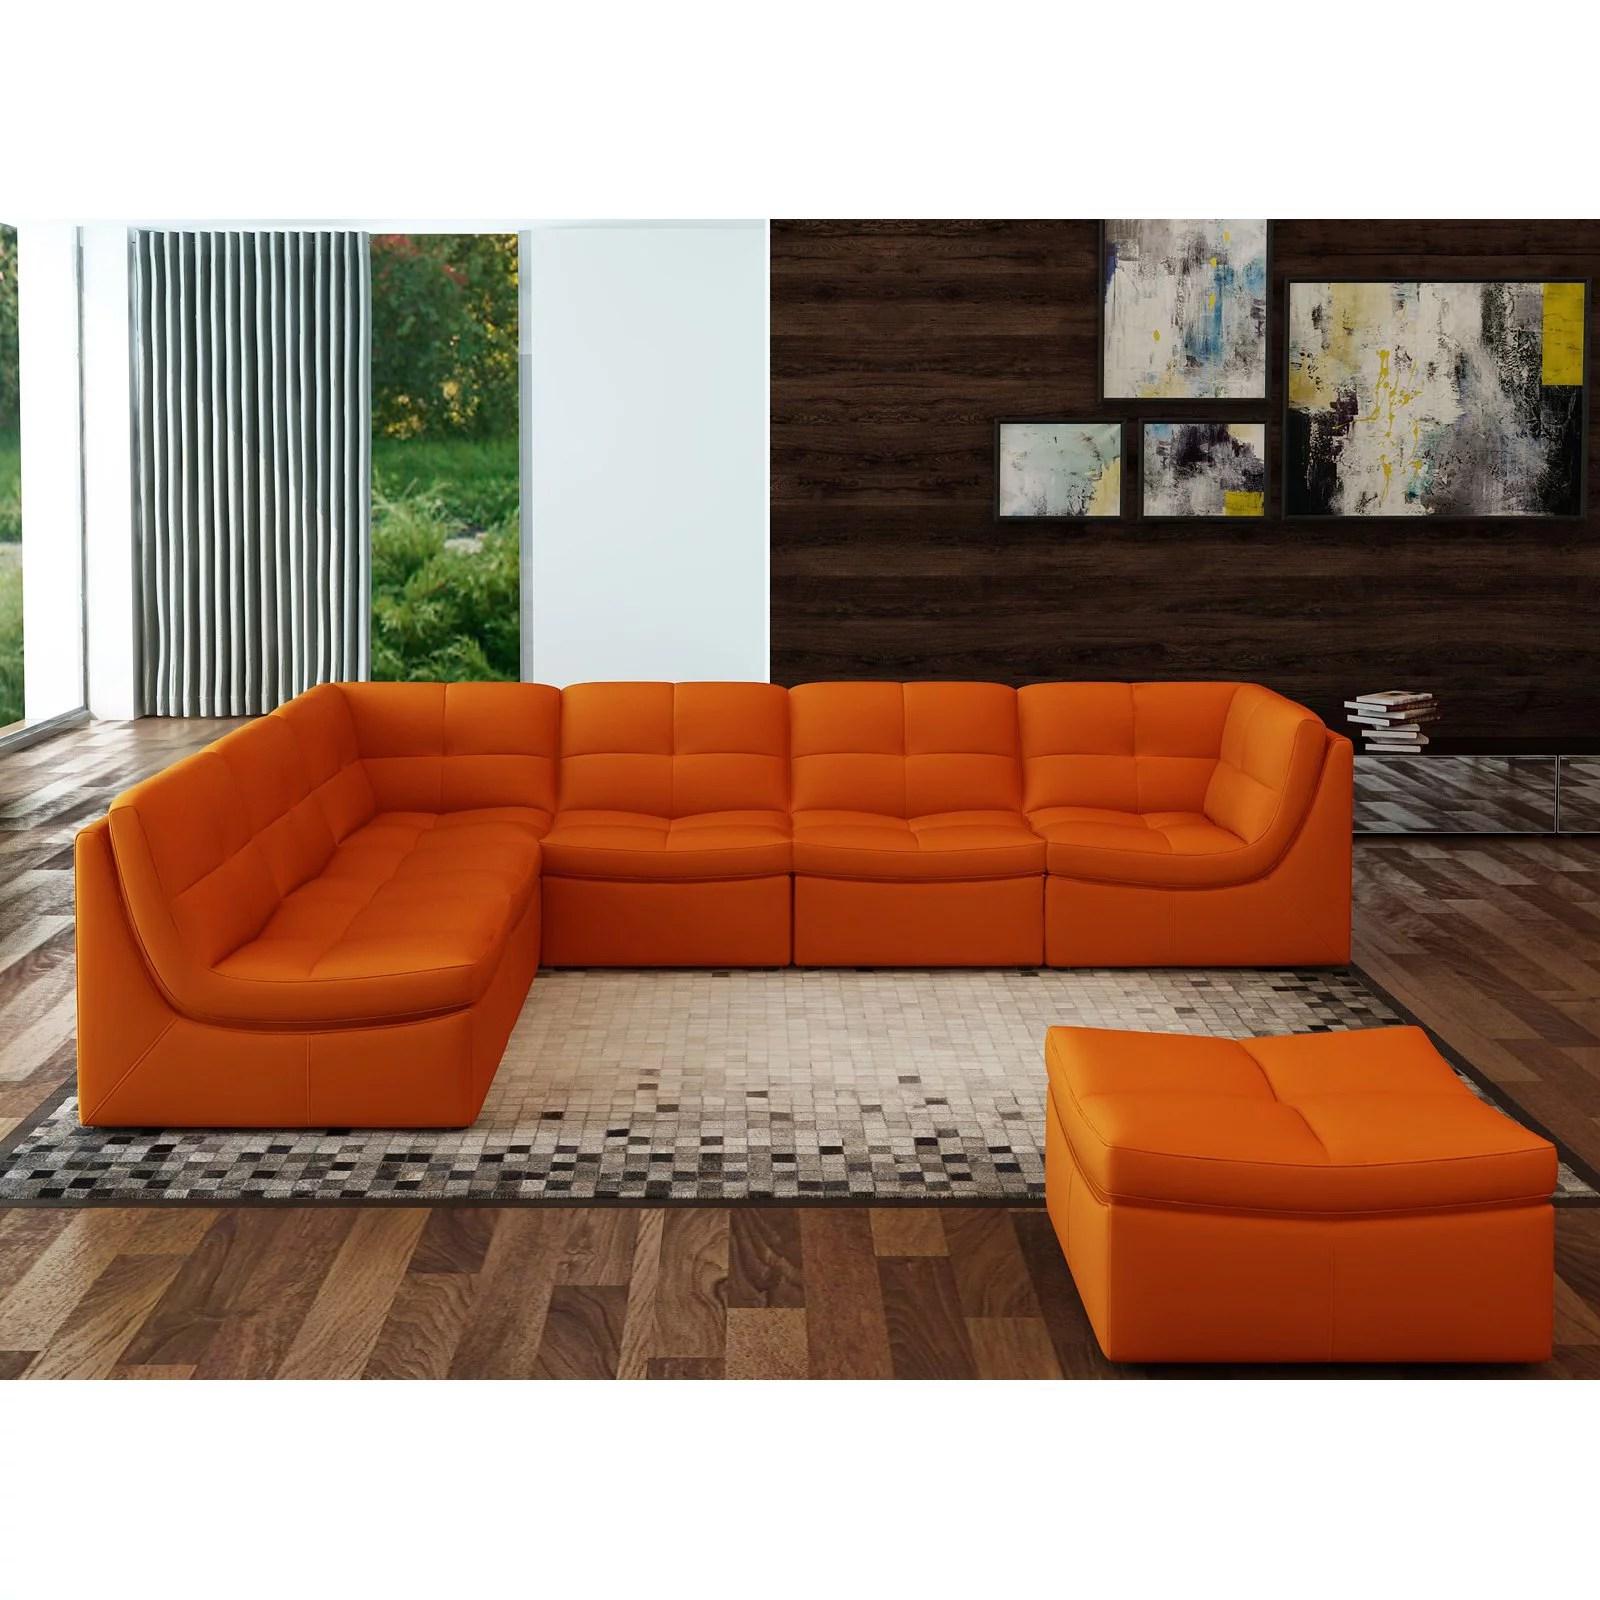 j m furniture lego 7 piece sectional sofa set